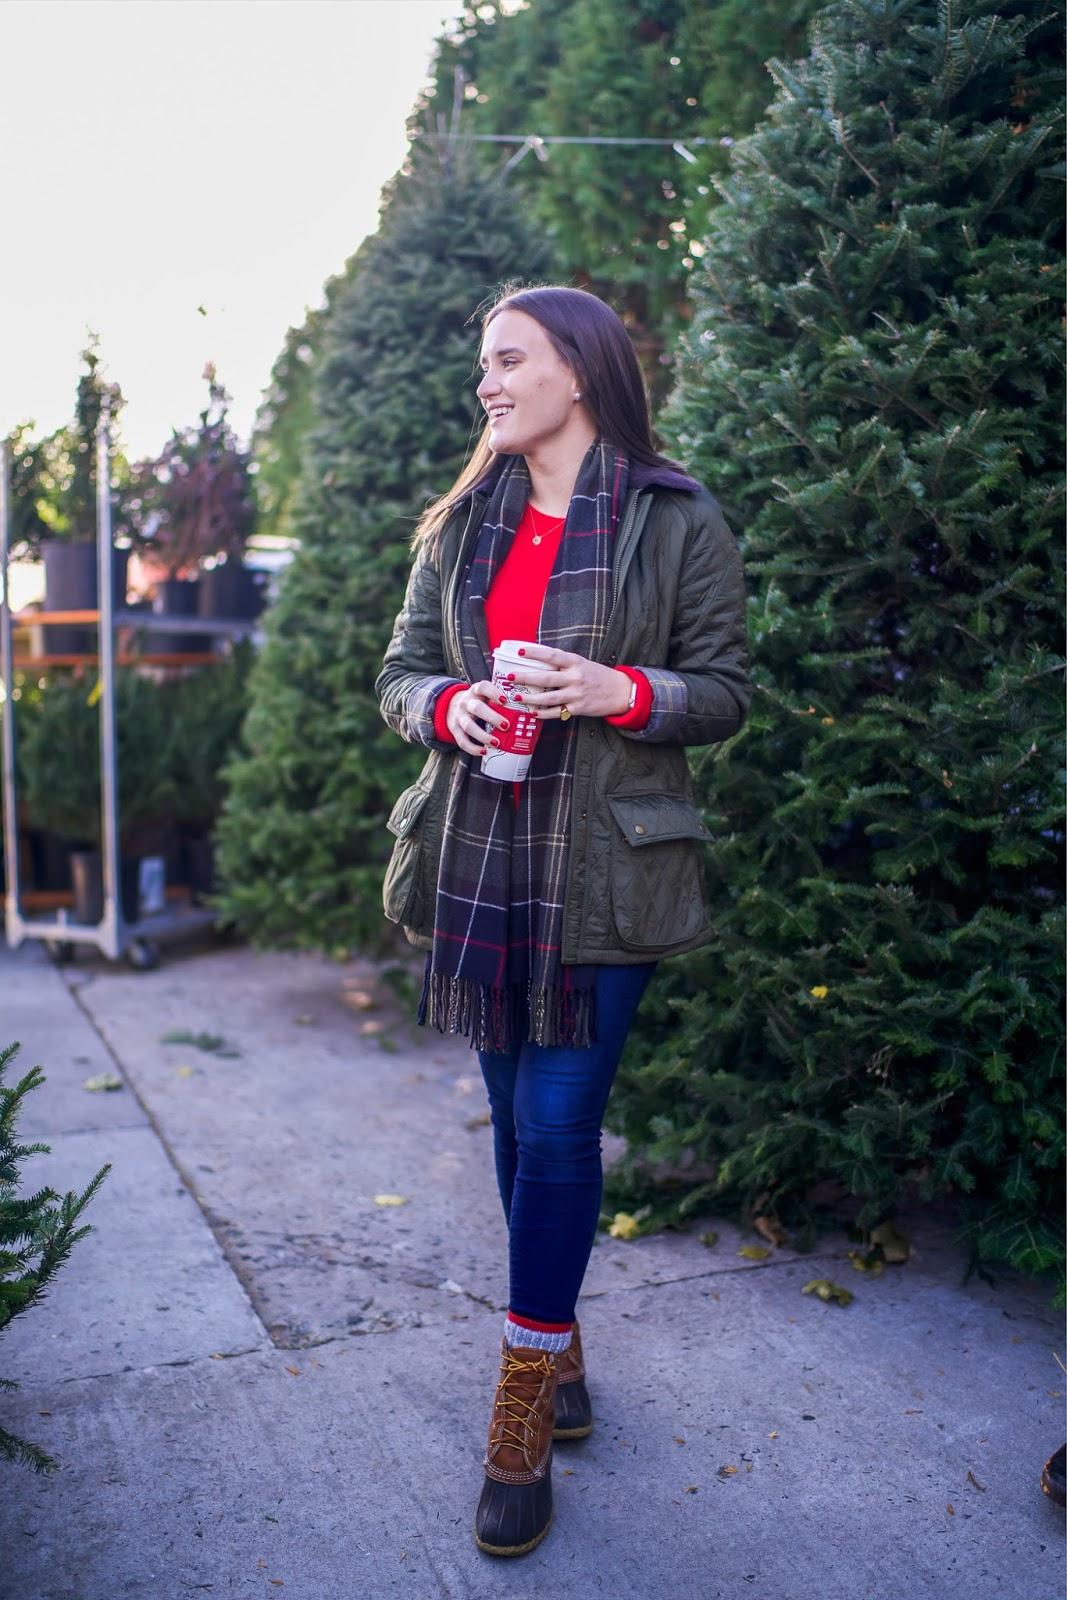 Ll Bean Christmas Trees.New Barbour Christmas Tree Shopping New York City